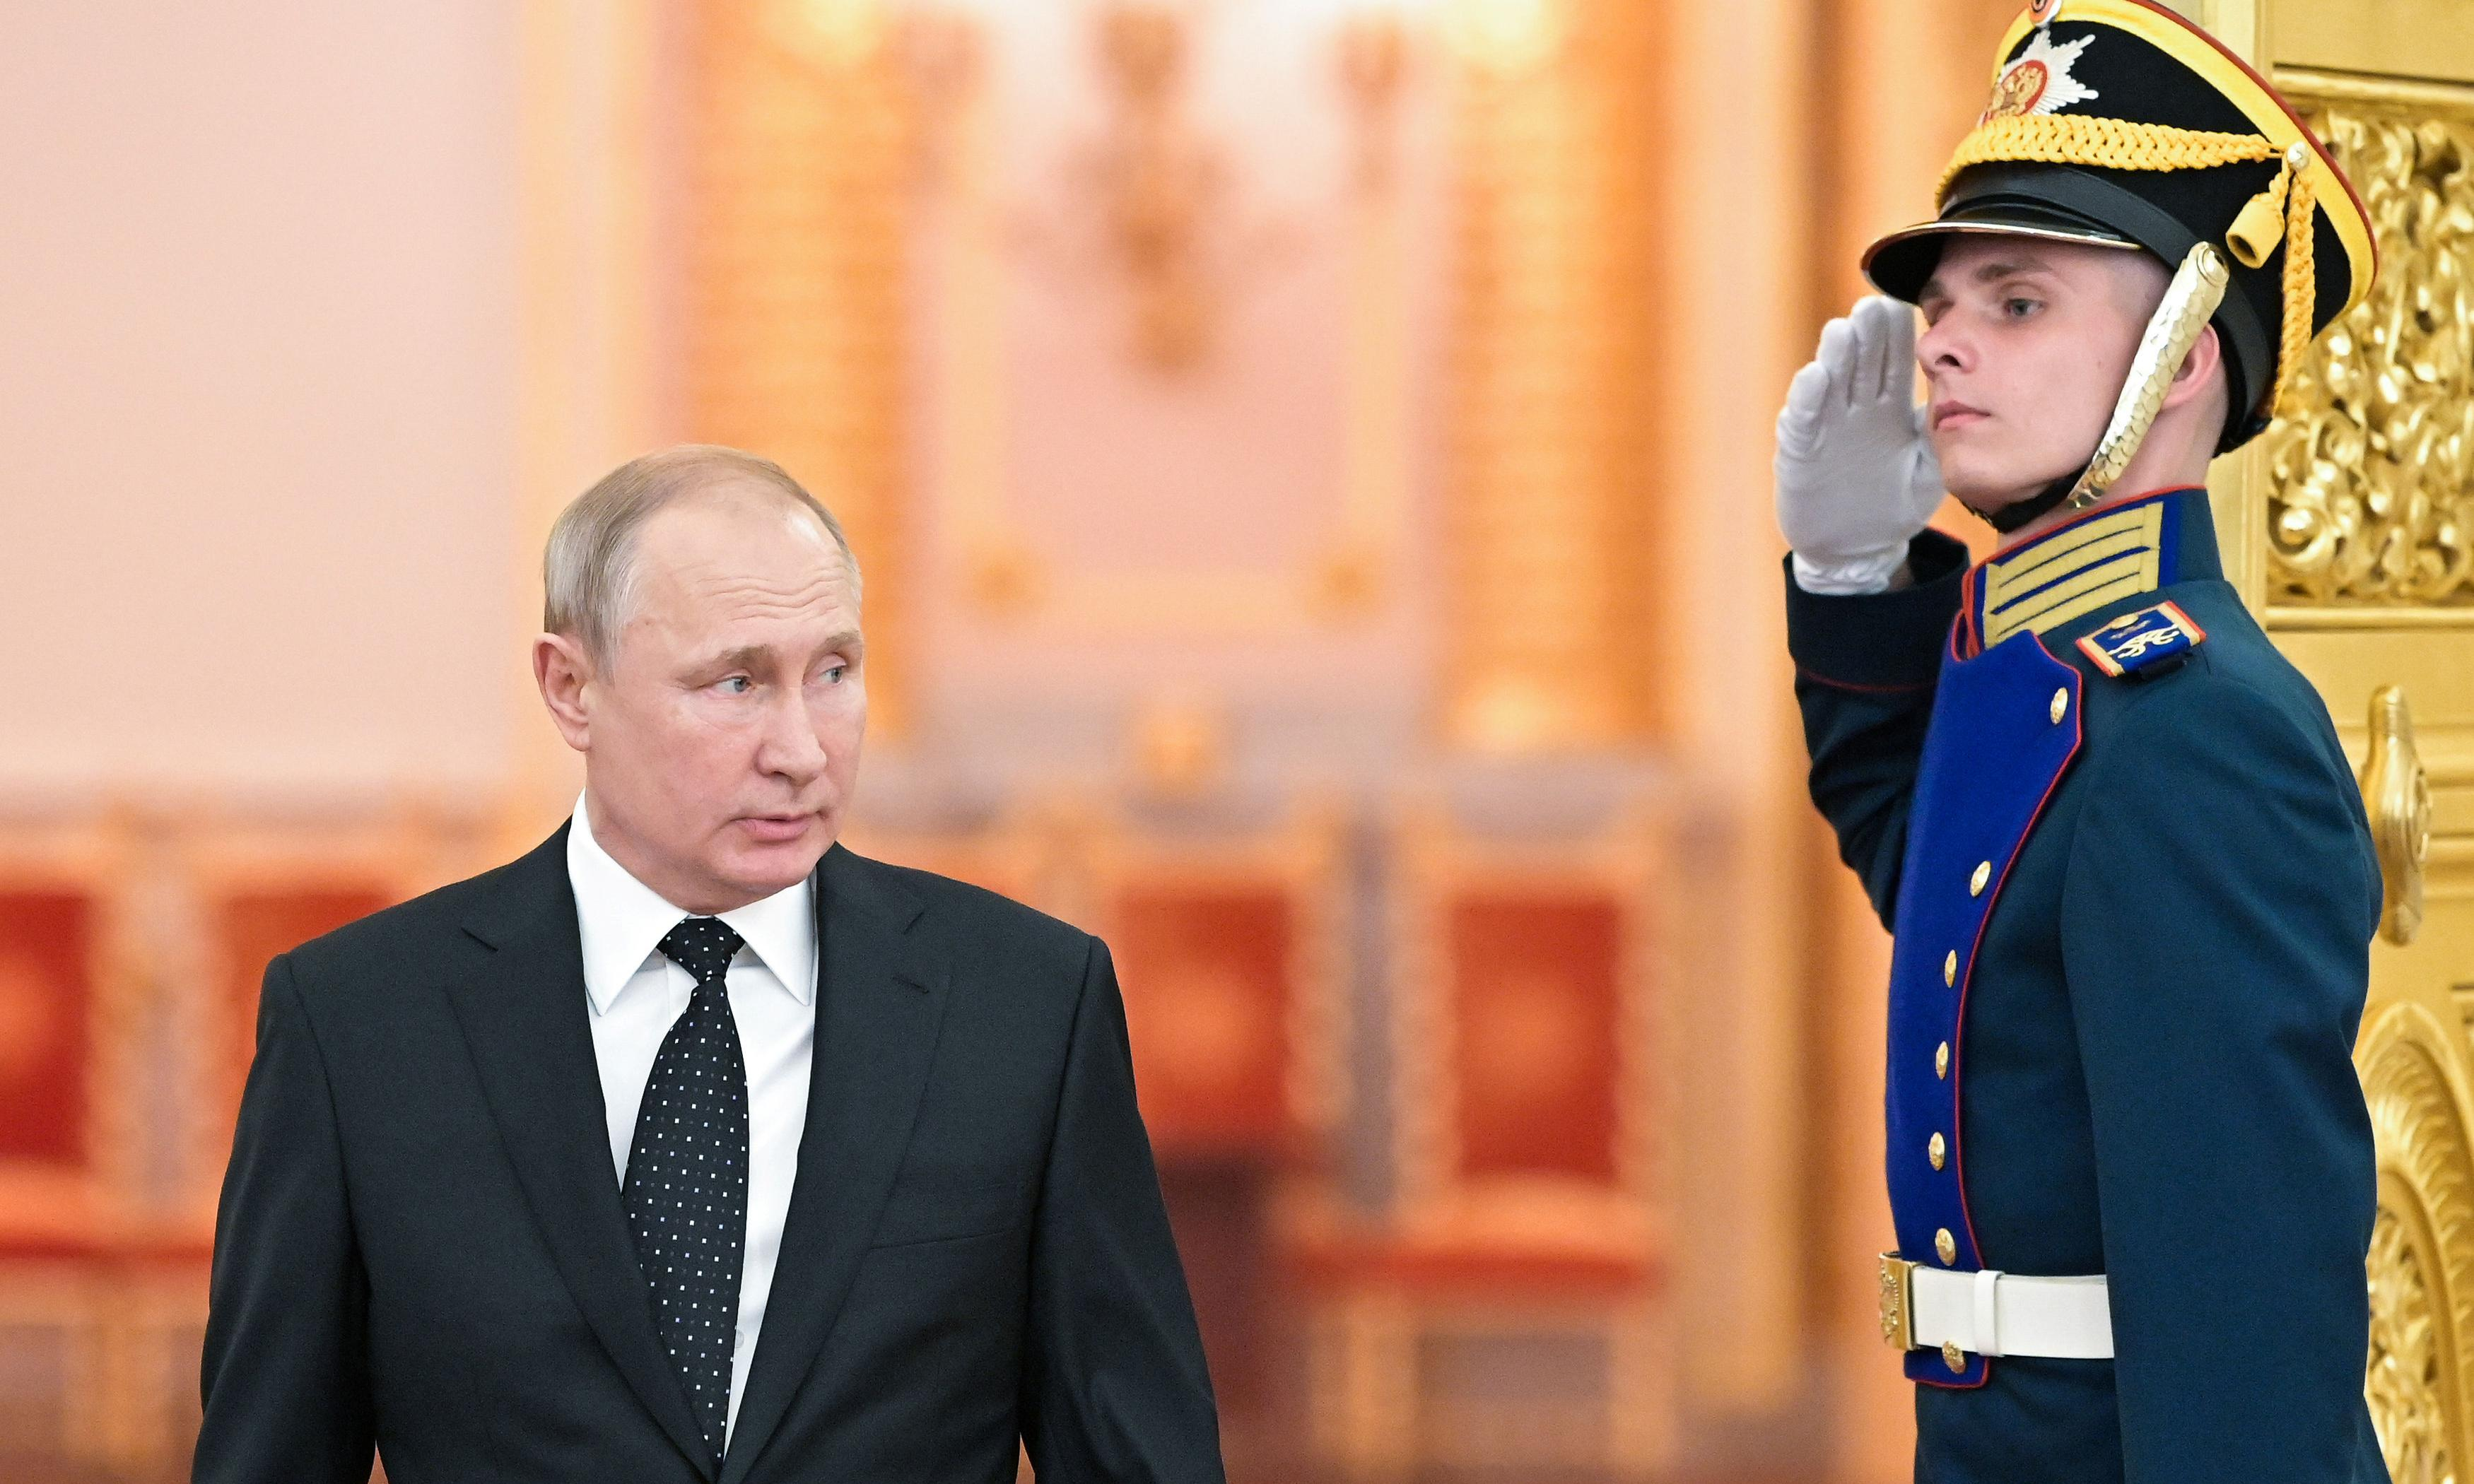 Theresa May to meet Vladimir Putin at G20 summit in Japan